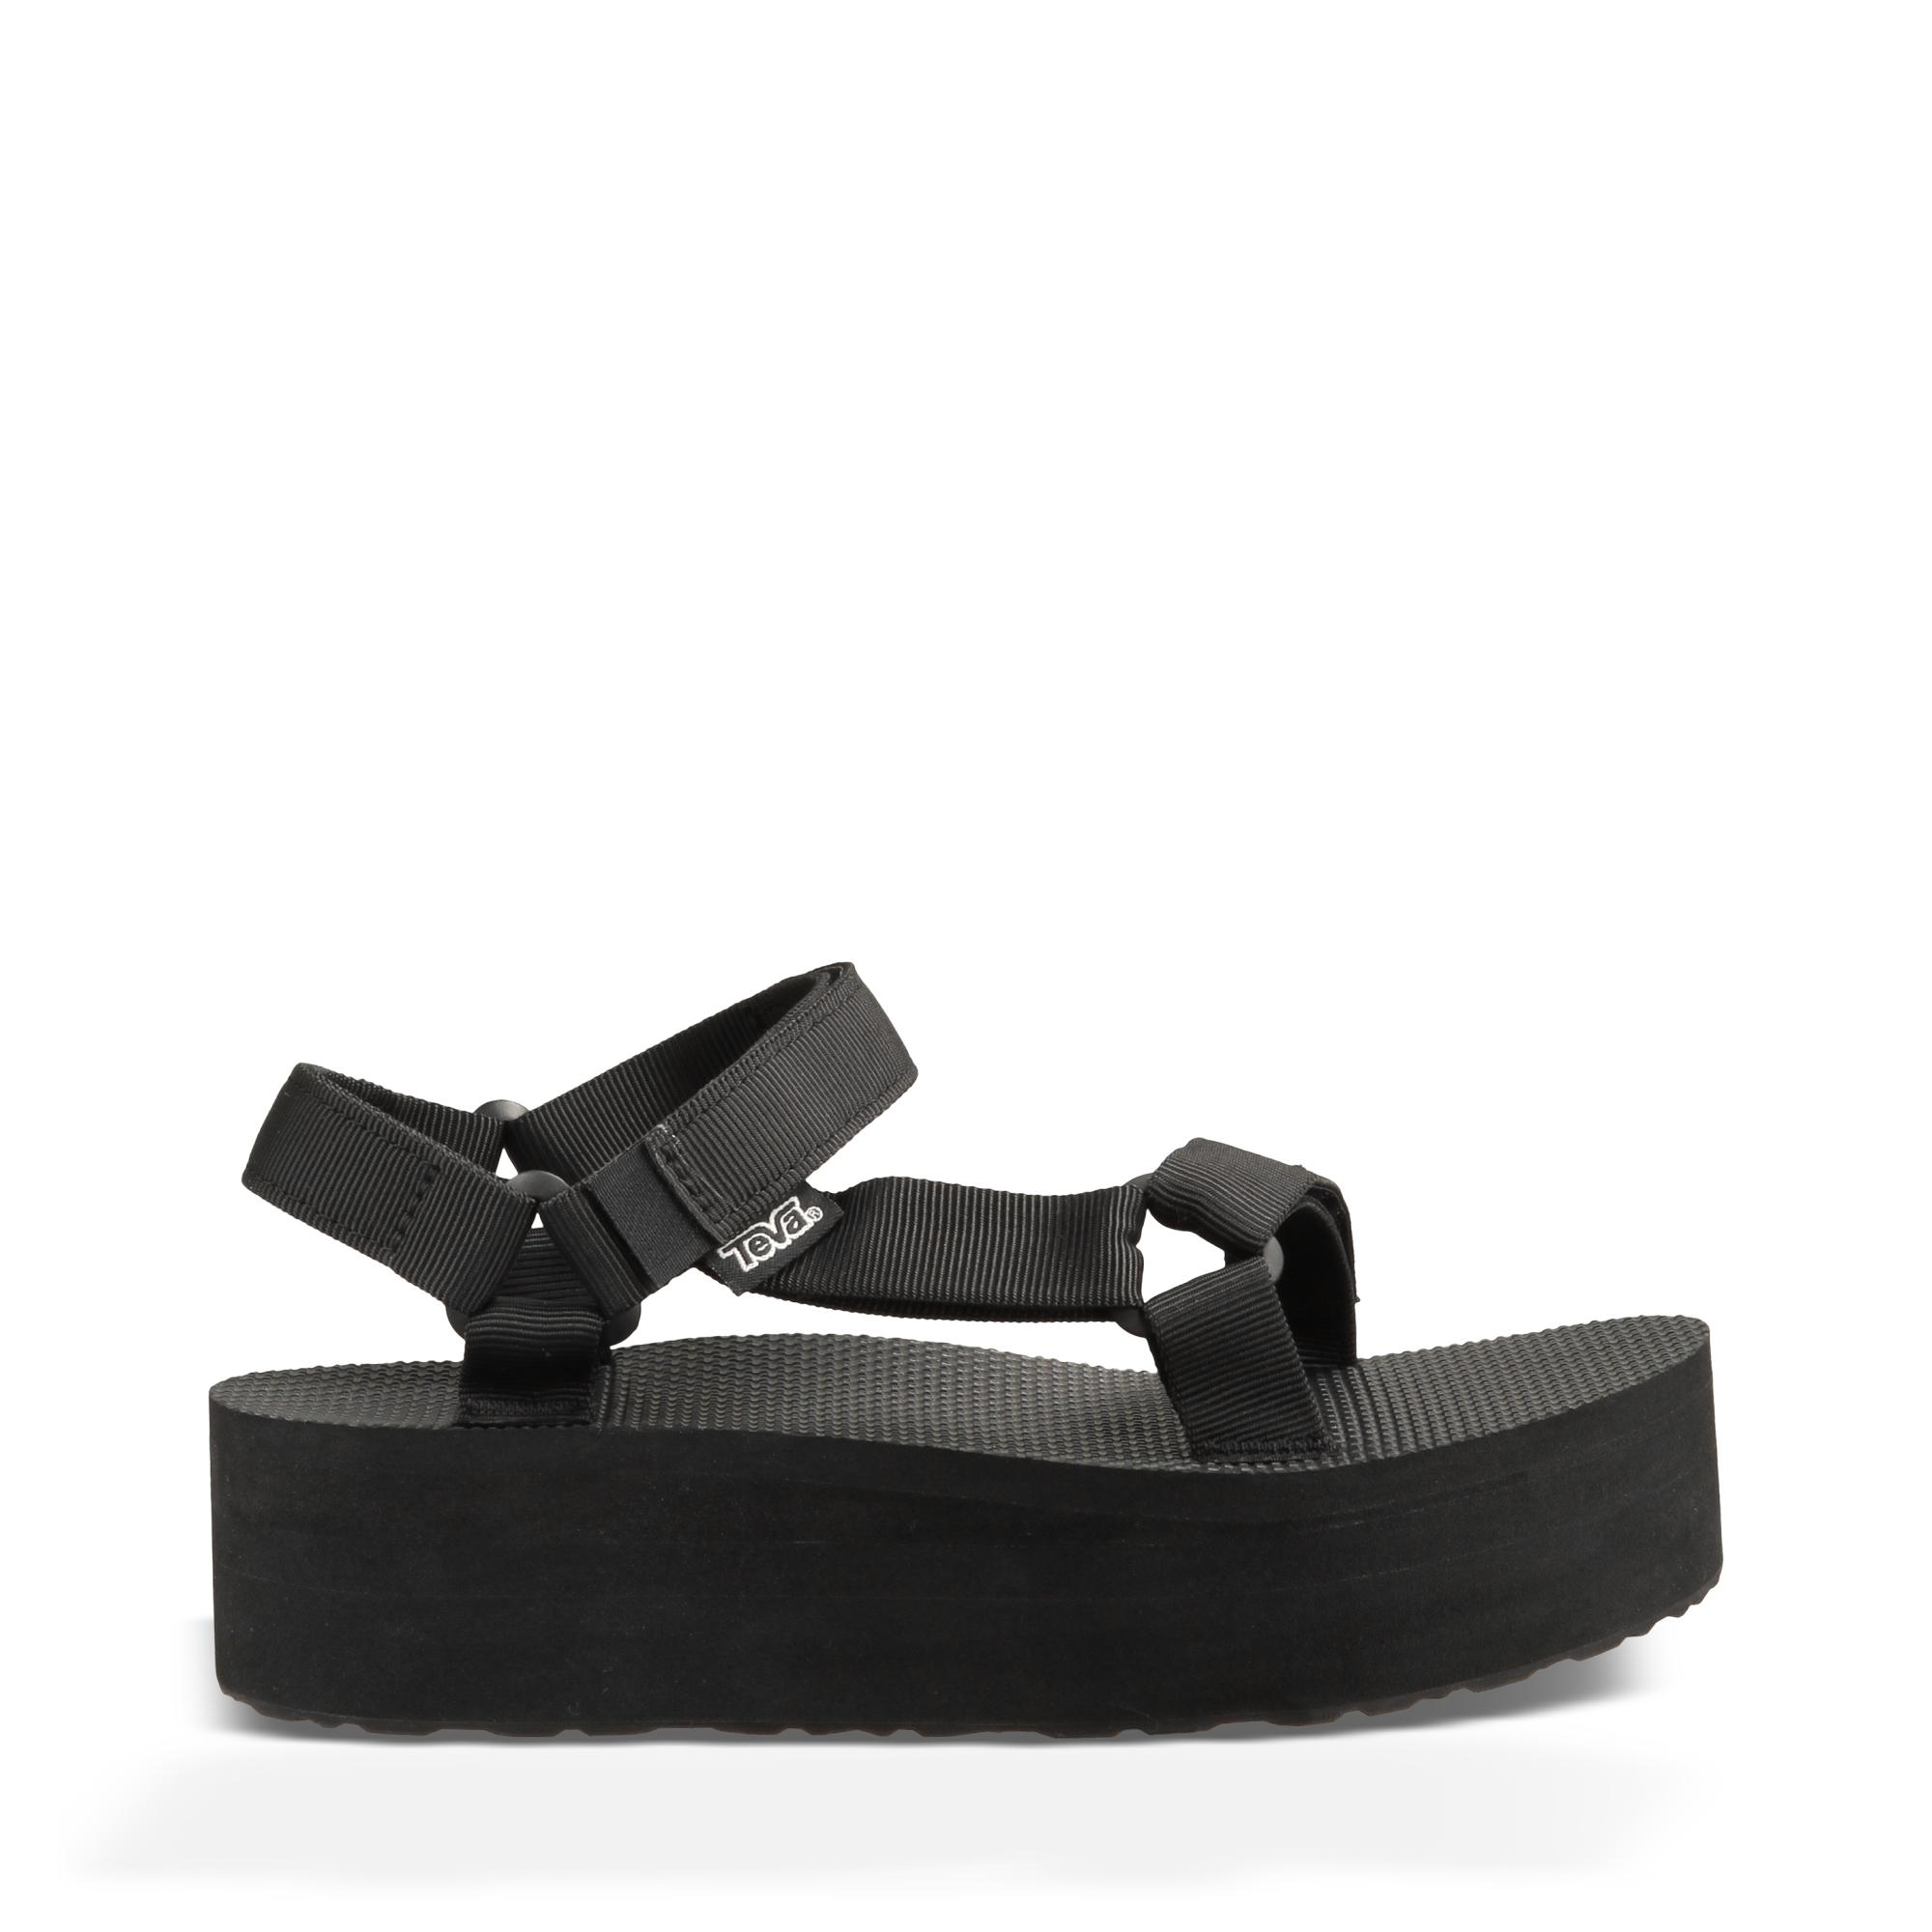 Teva Woman's Flatform Universal sandal